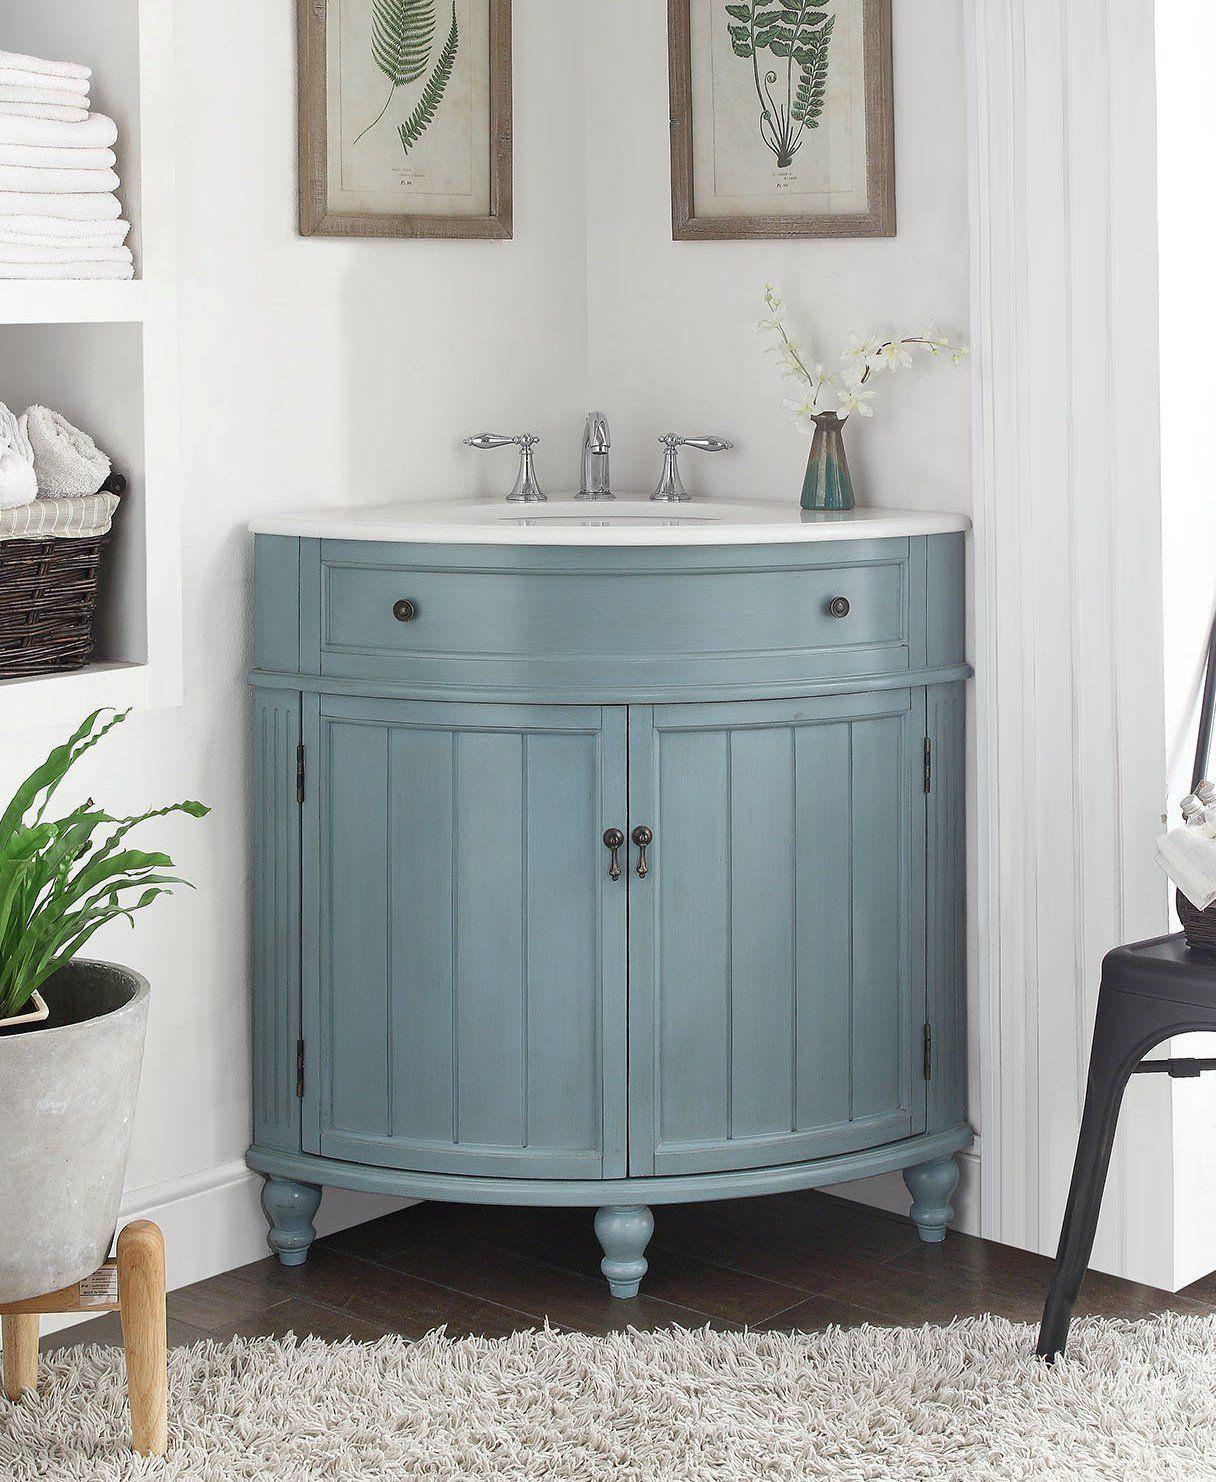 Blue cottage bathrooms - 24 Vintage Light Blue Cottage Style Thomasville Bathroom Sink Vanity Model